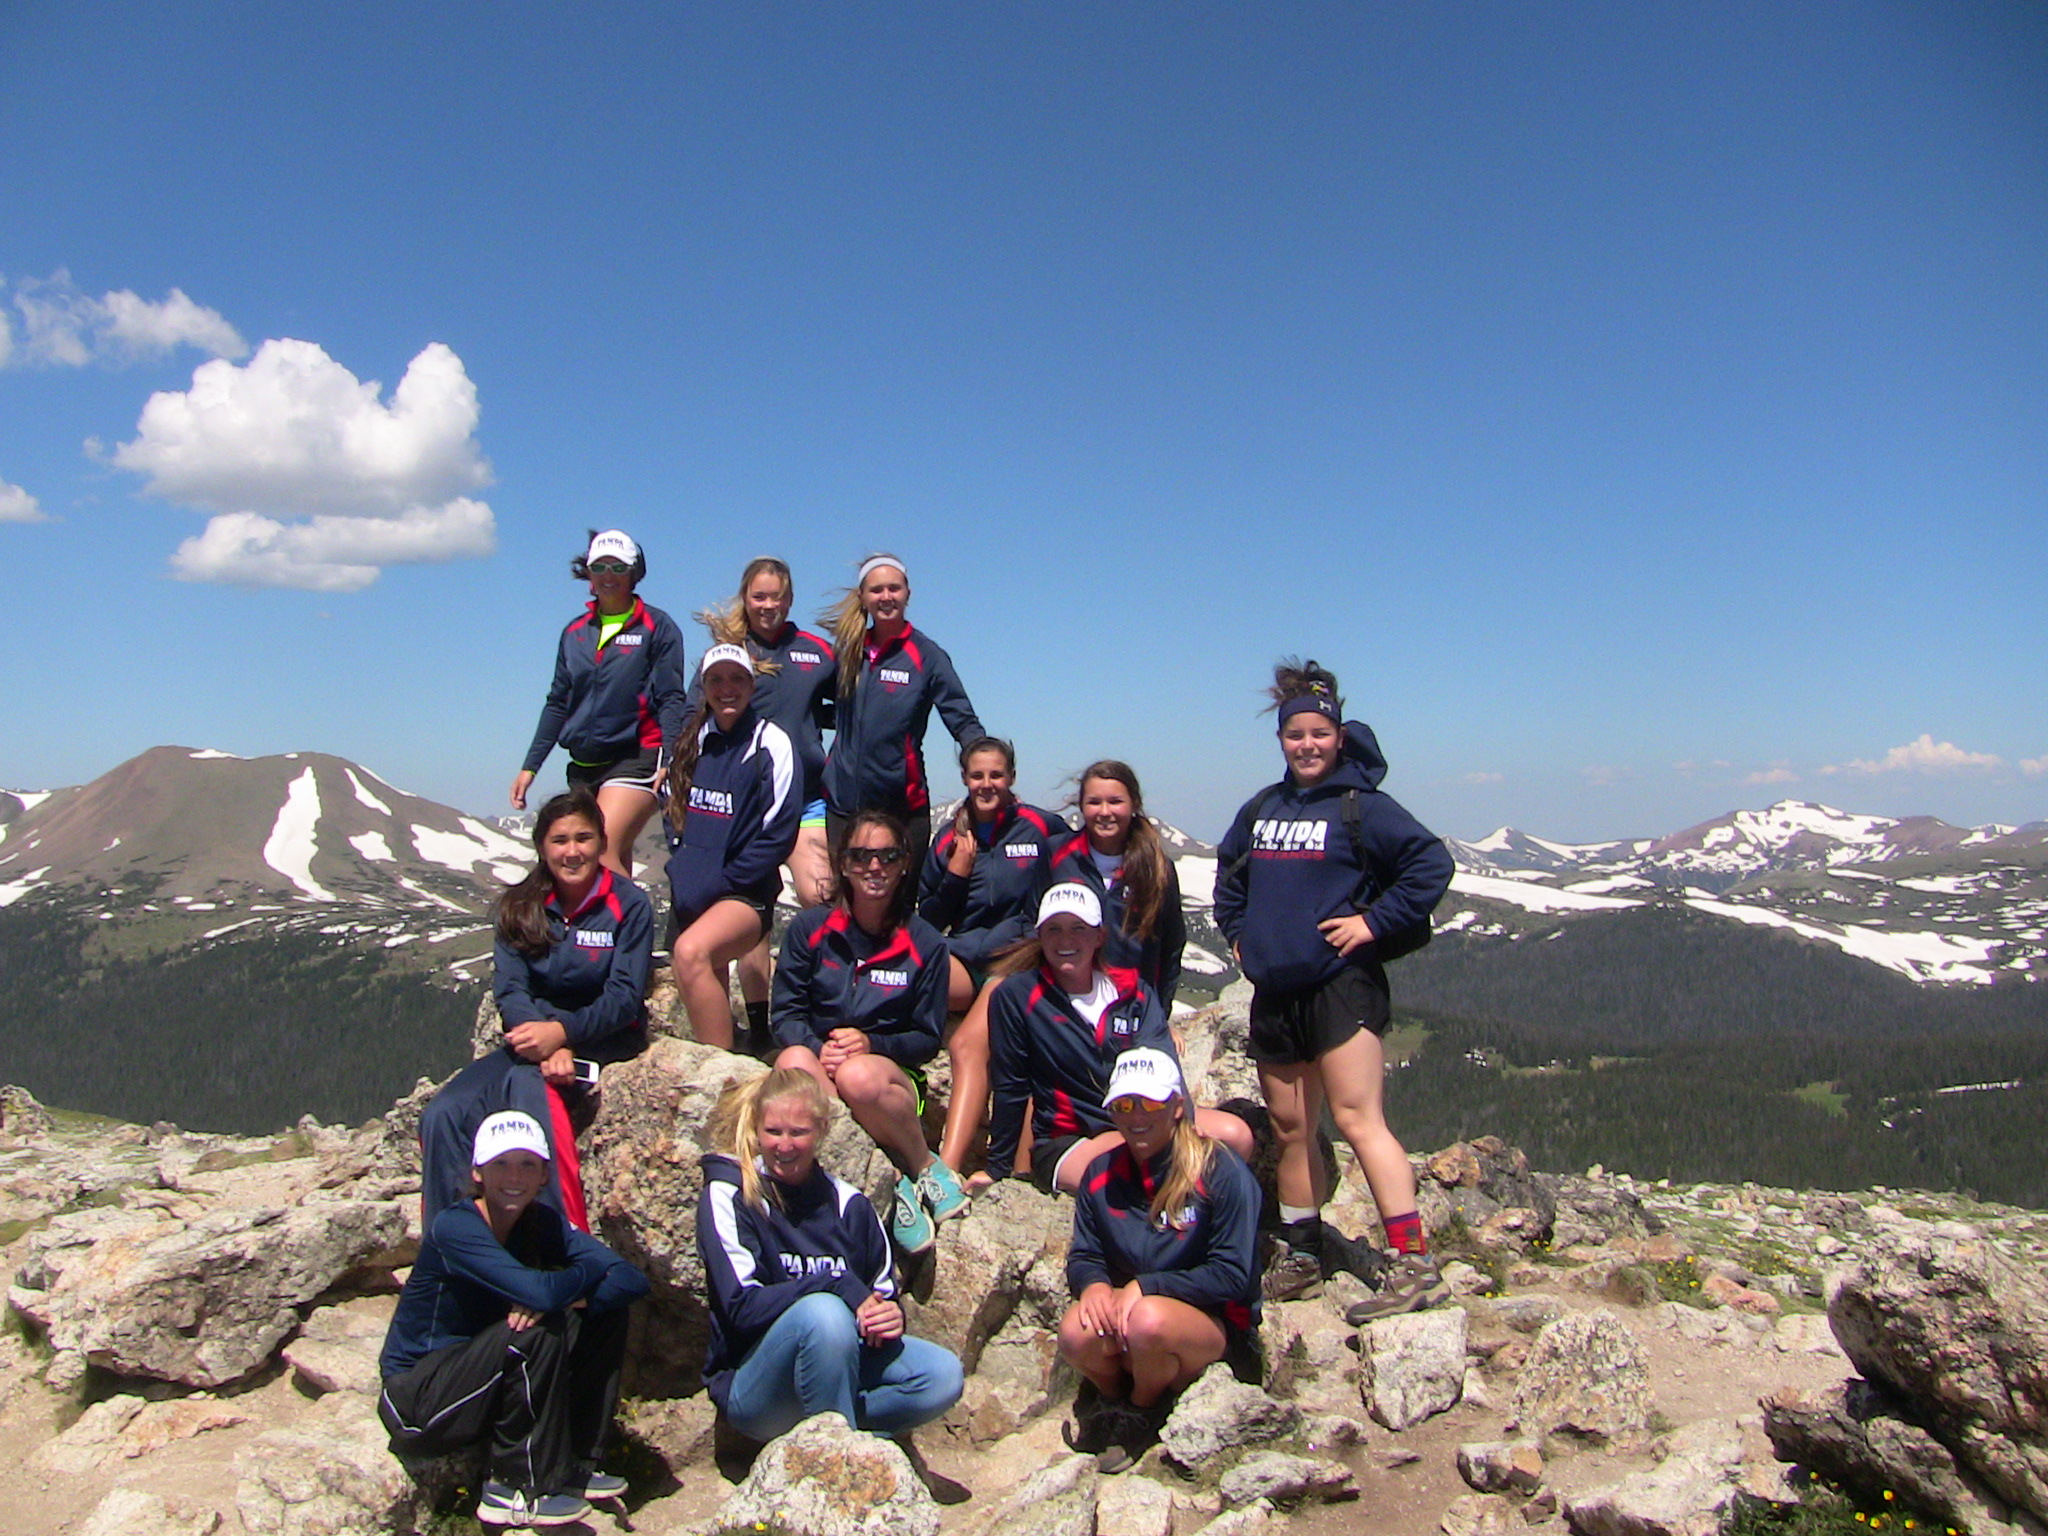 Tjs team in Colorado 2014.jpg